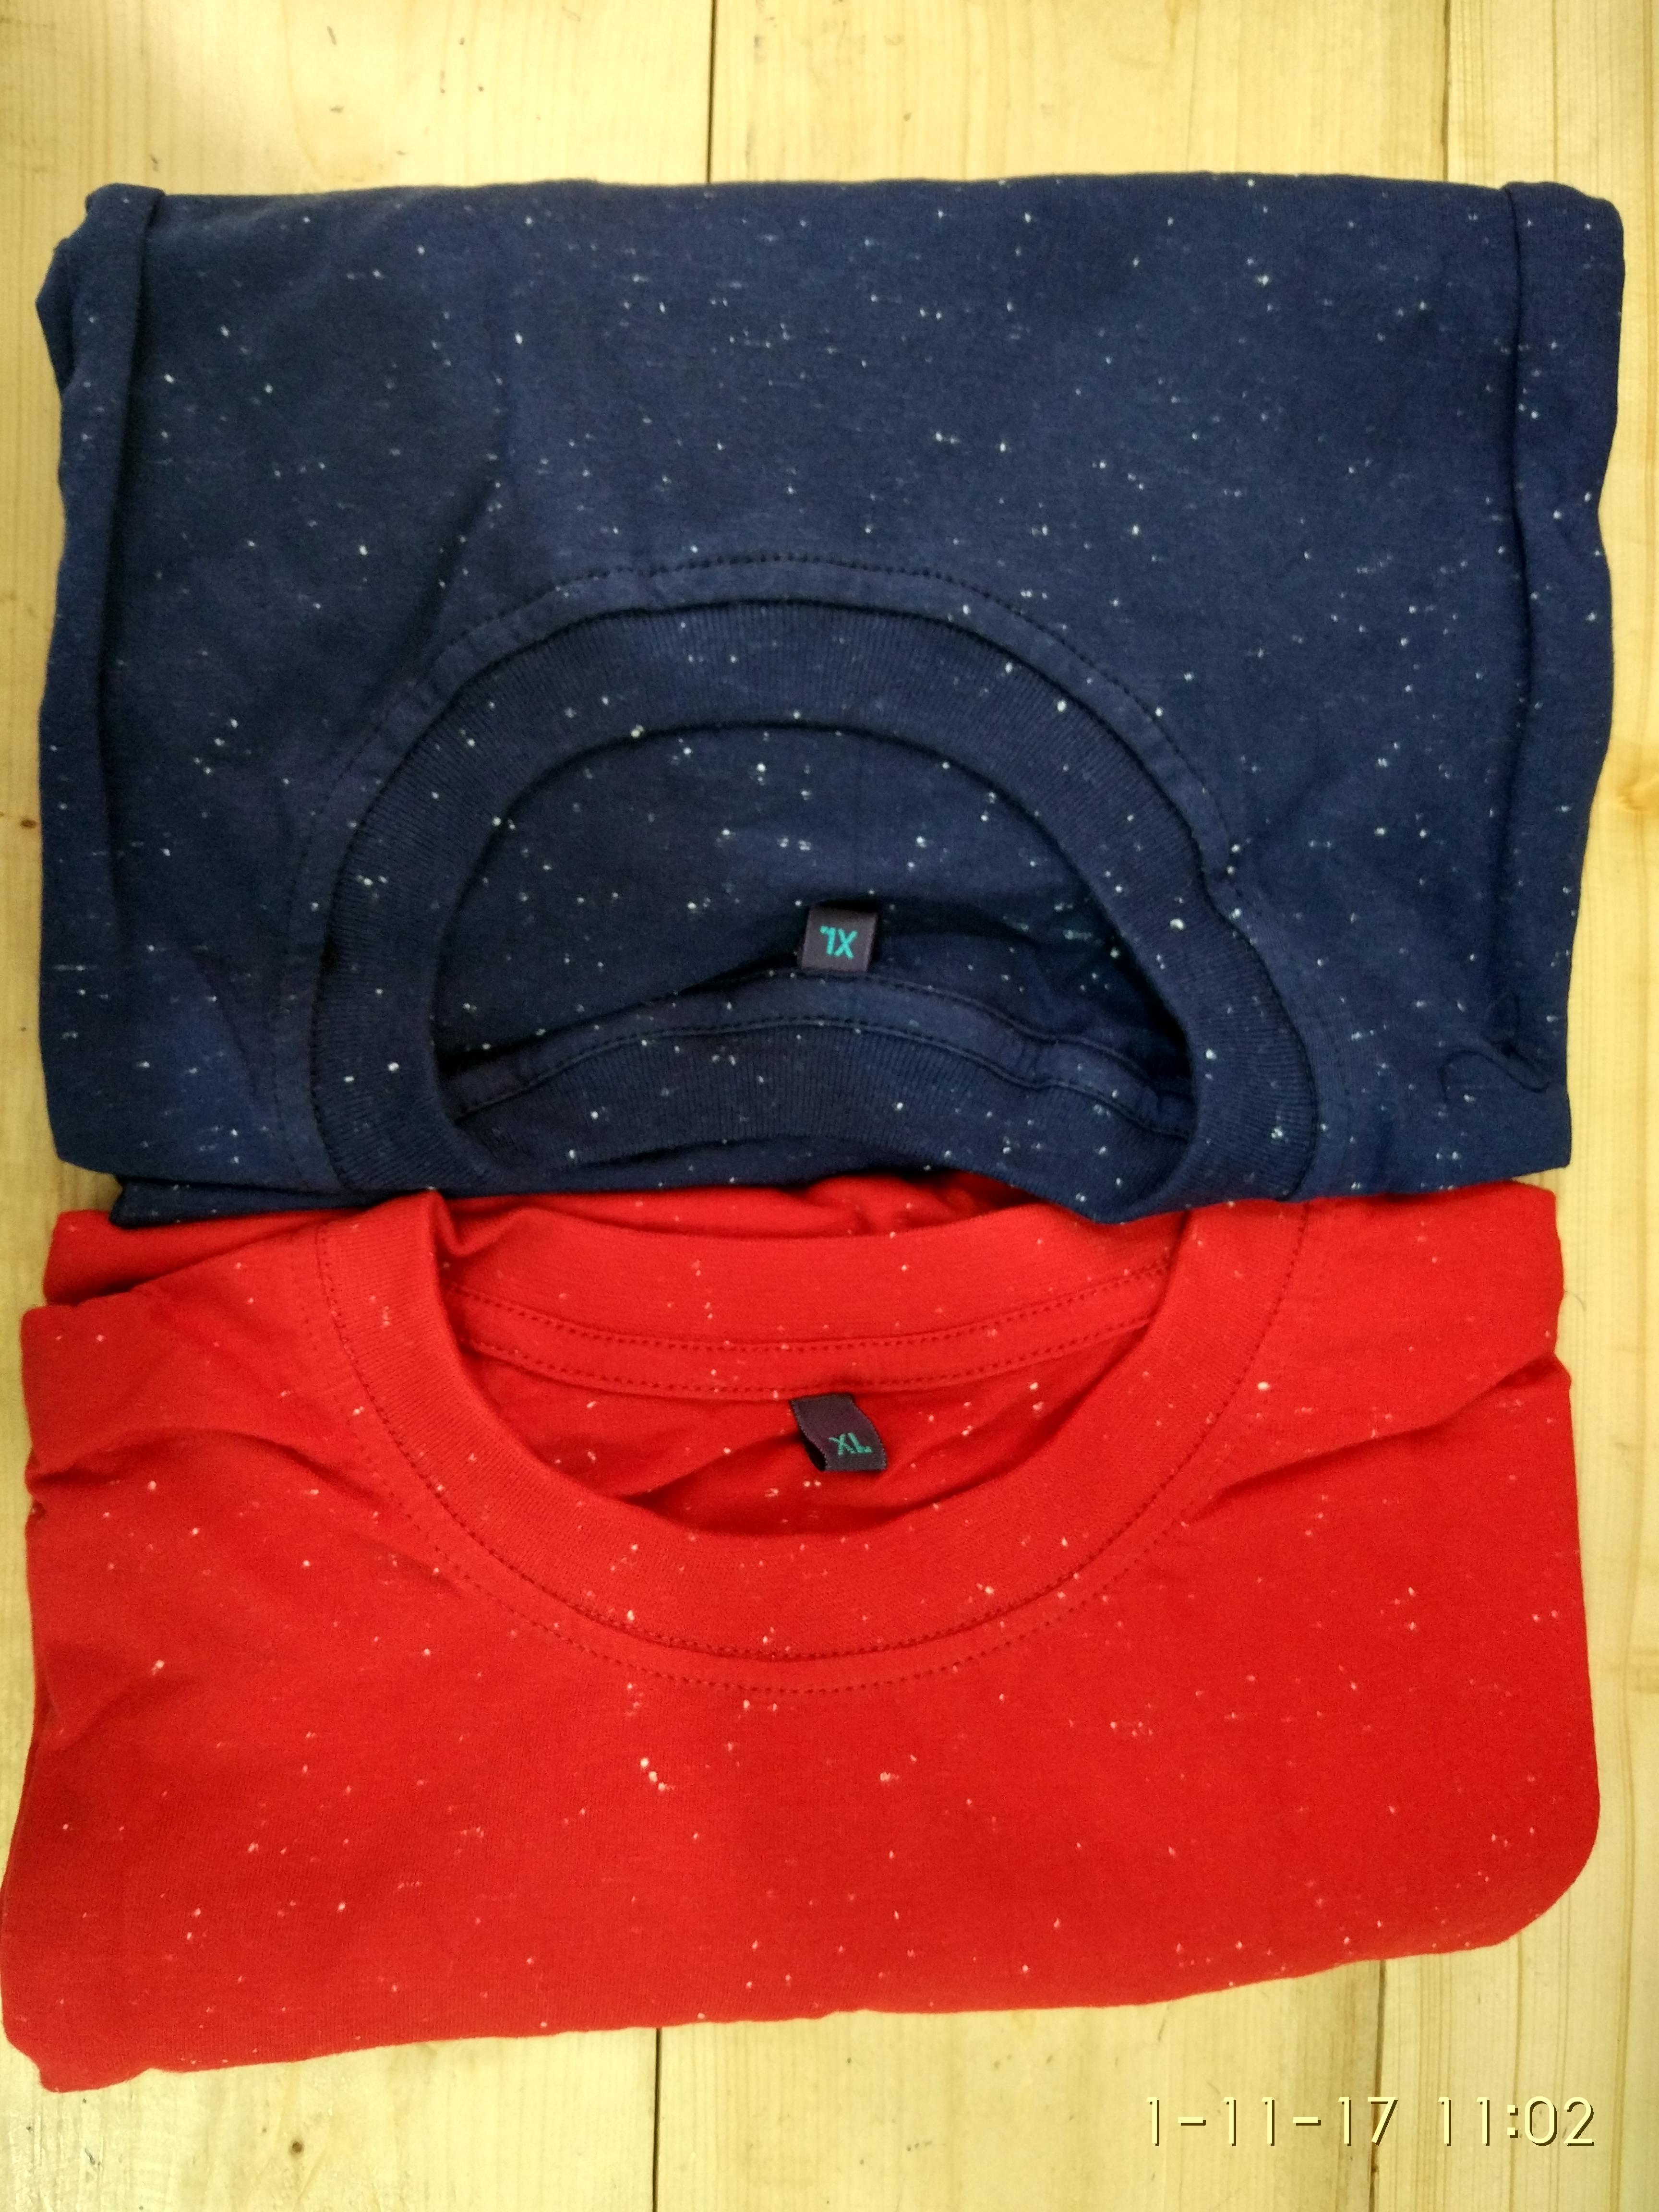 Grosir Kaos Polos Murah Jual Cotton Combed Grosiran Size M 20s Kami Bukan Ahlinya Dalam Penjualan Online Di Situs Besar Seperti Lazada Bukalapak Atau Shopee Tetapi Produk Sudah Tersebar